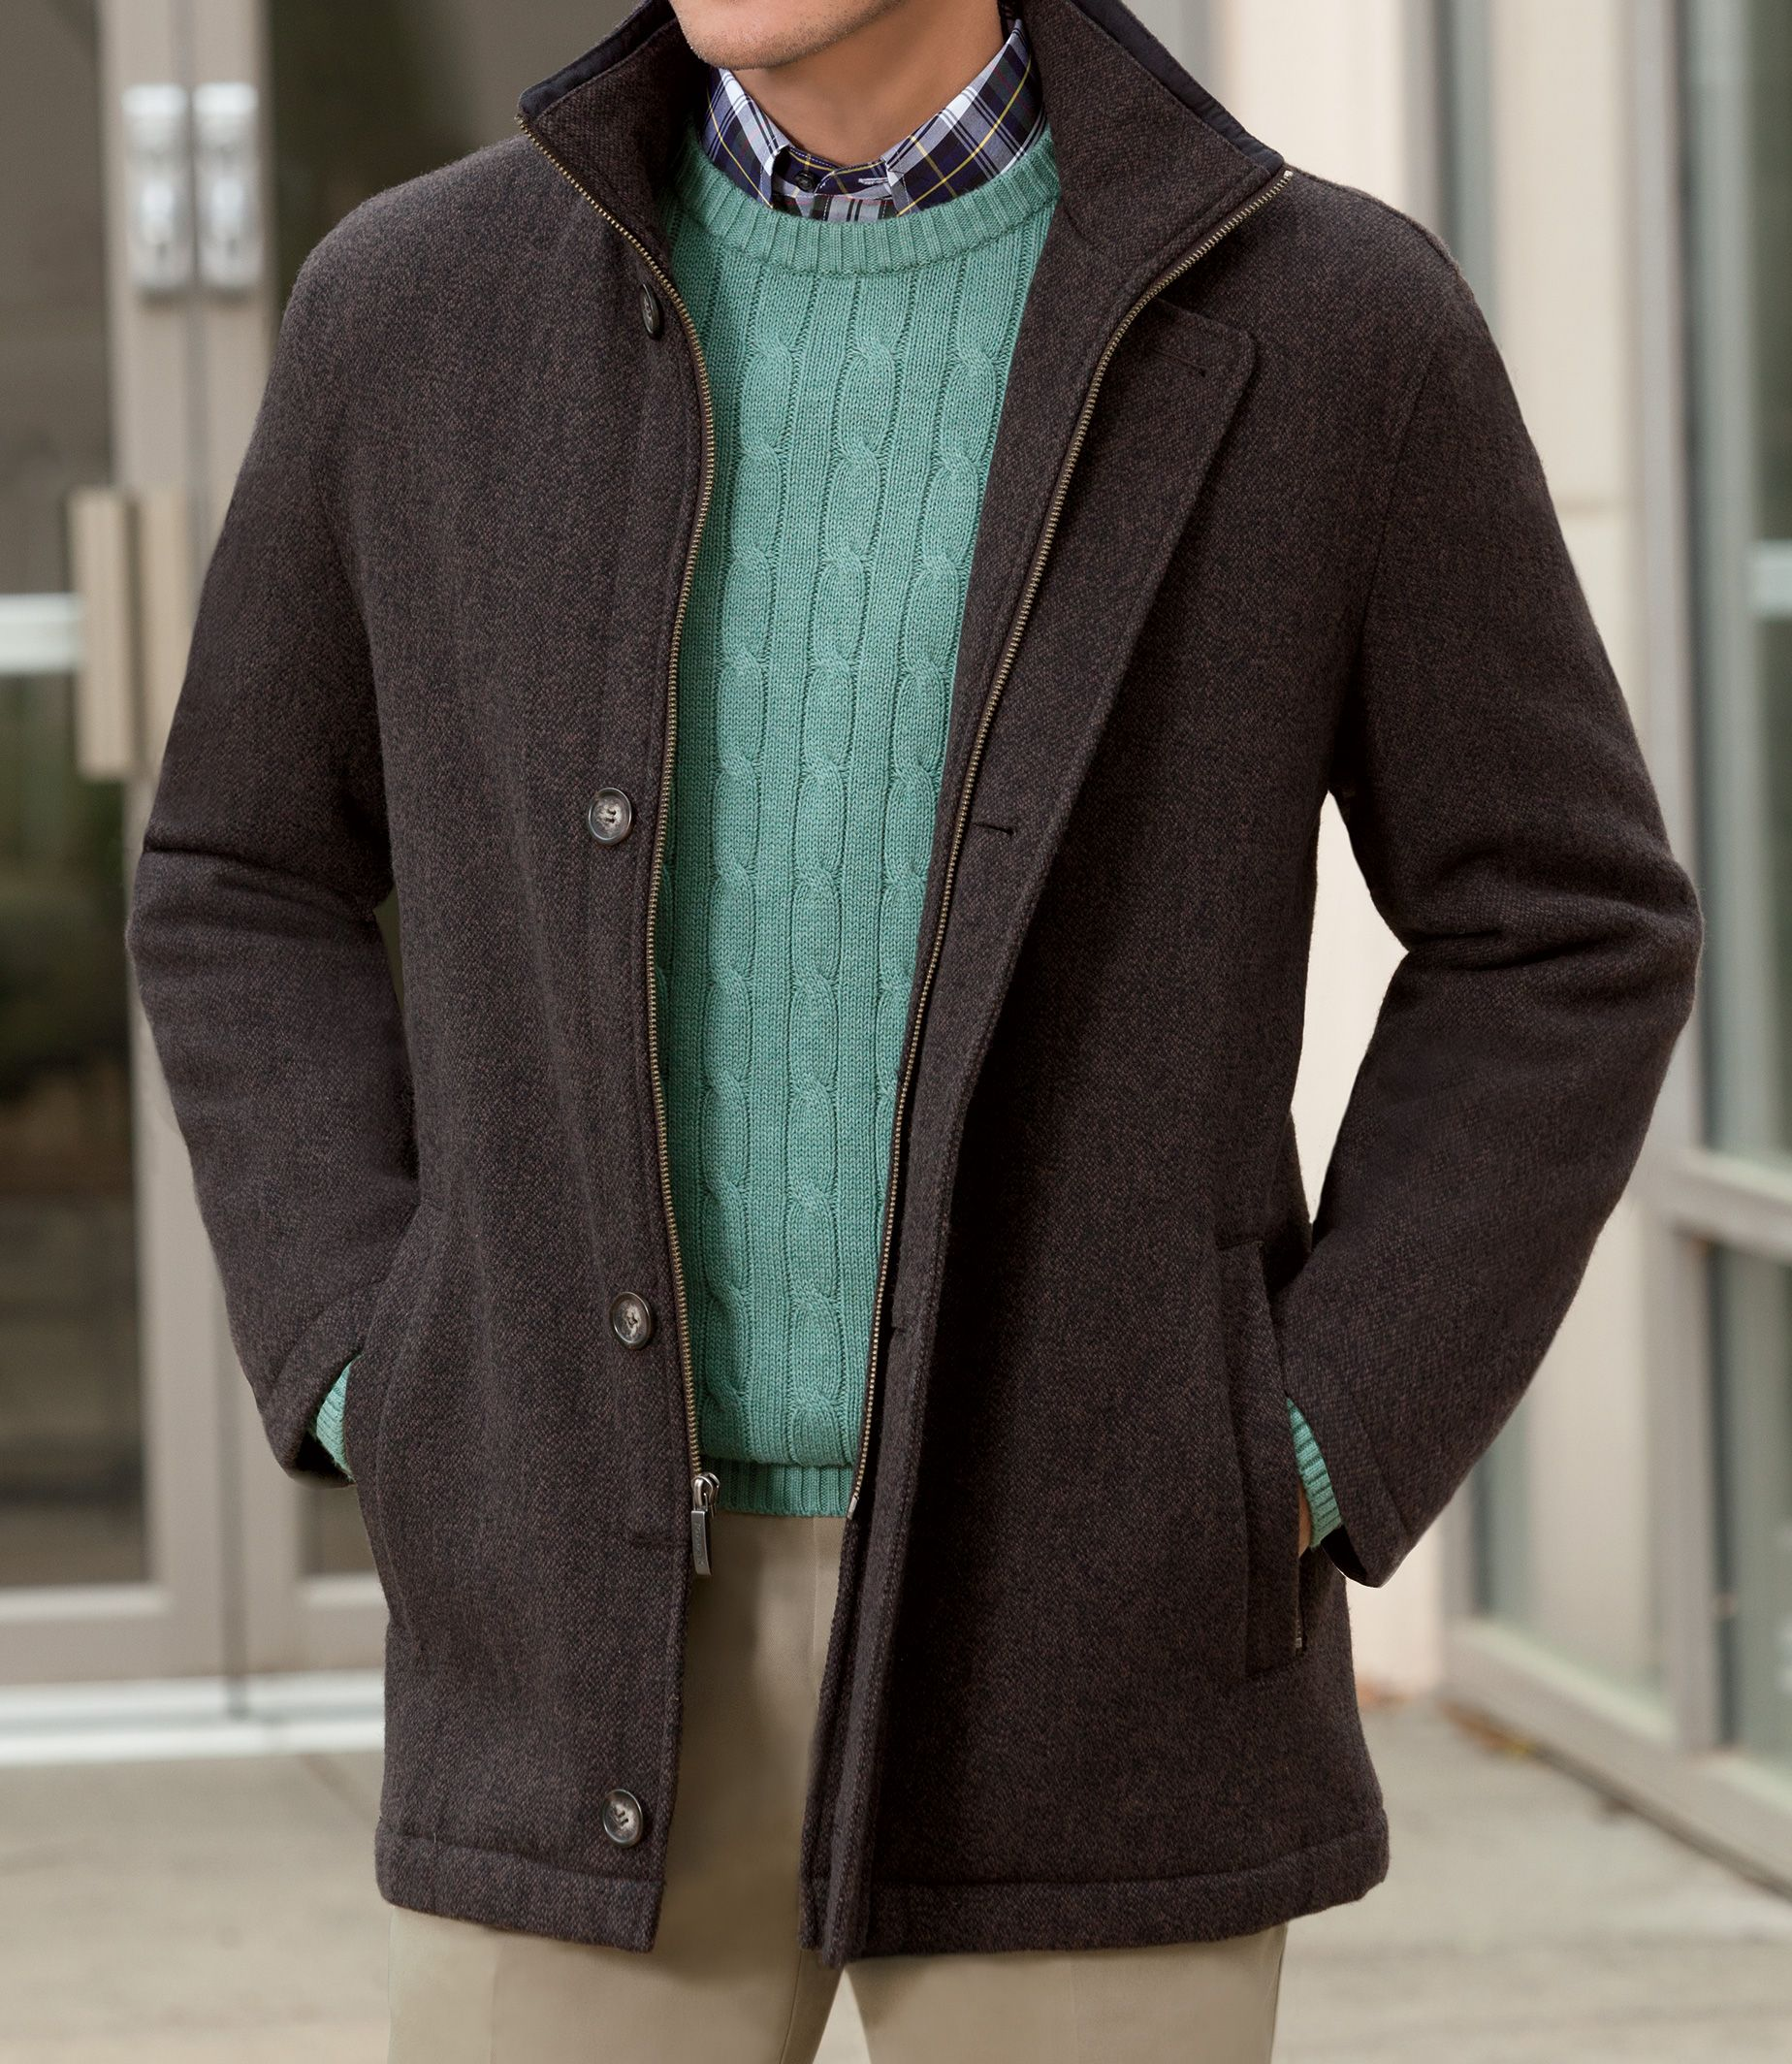 Men's Wool Casual Coats & Jackets | Men's Outerwear | JoS. A. Bank ...